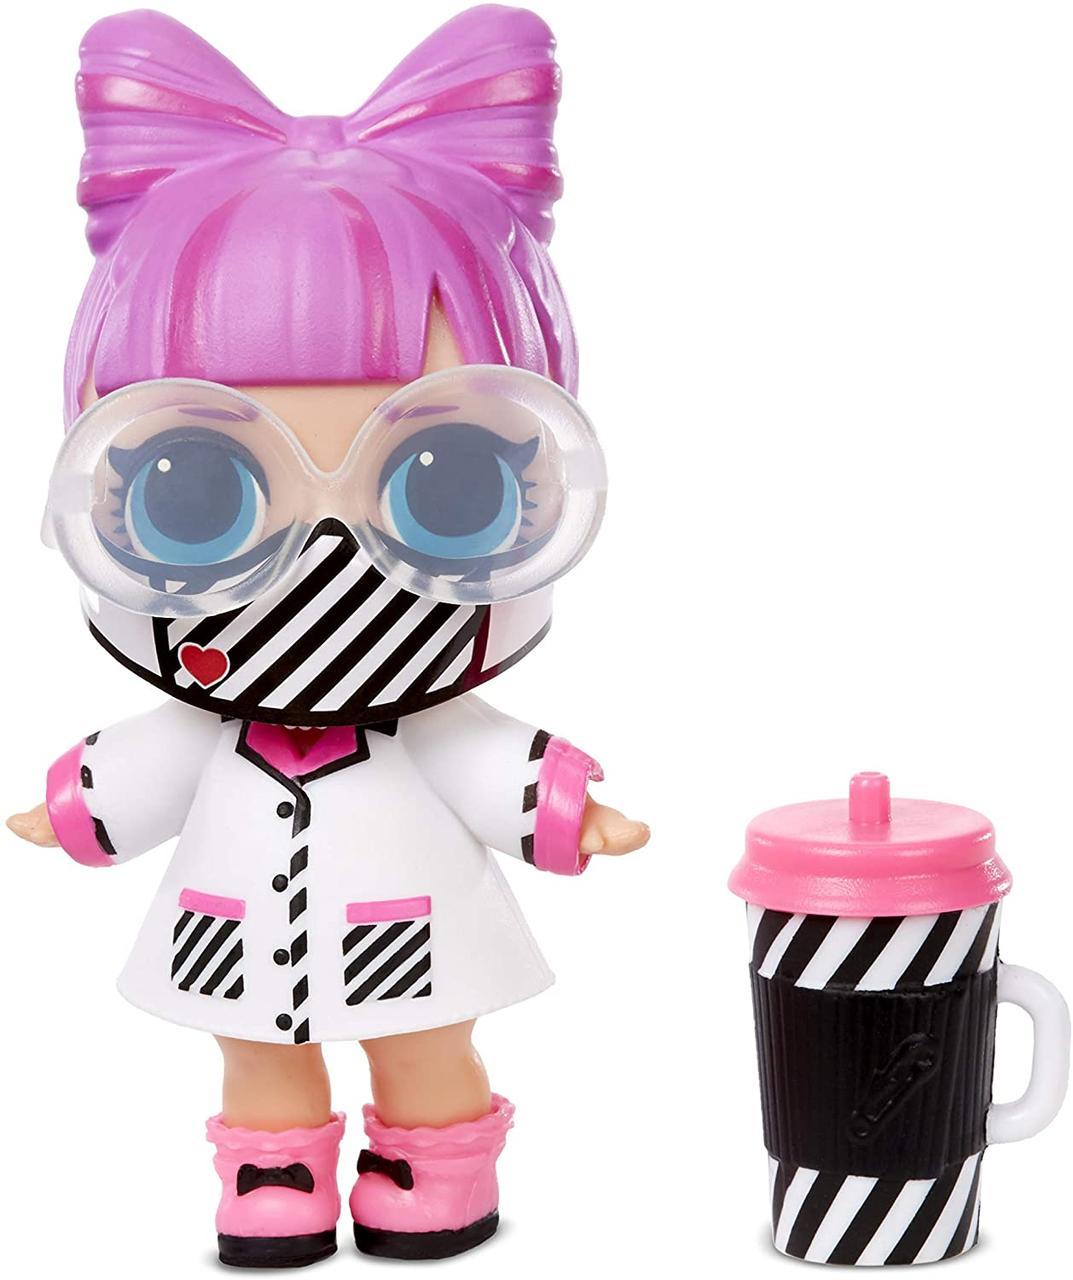 L.O.L. Surprise! лялька ЛОЛ з маскою серія пандемія MGAE Cares Limited Edition Frontline Hero with 7 Surprises